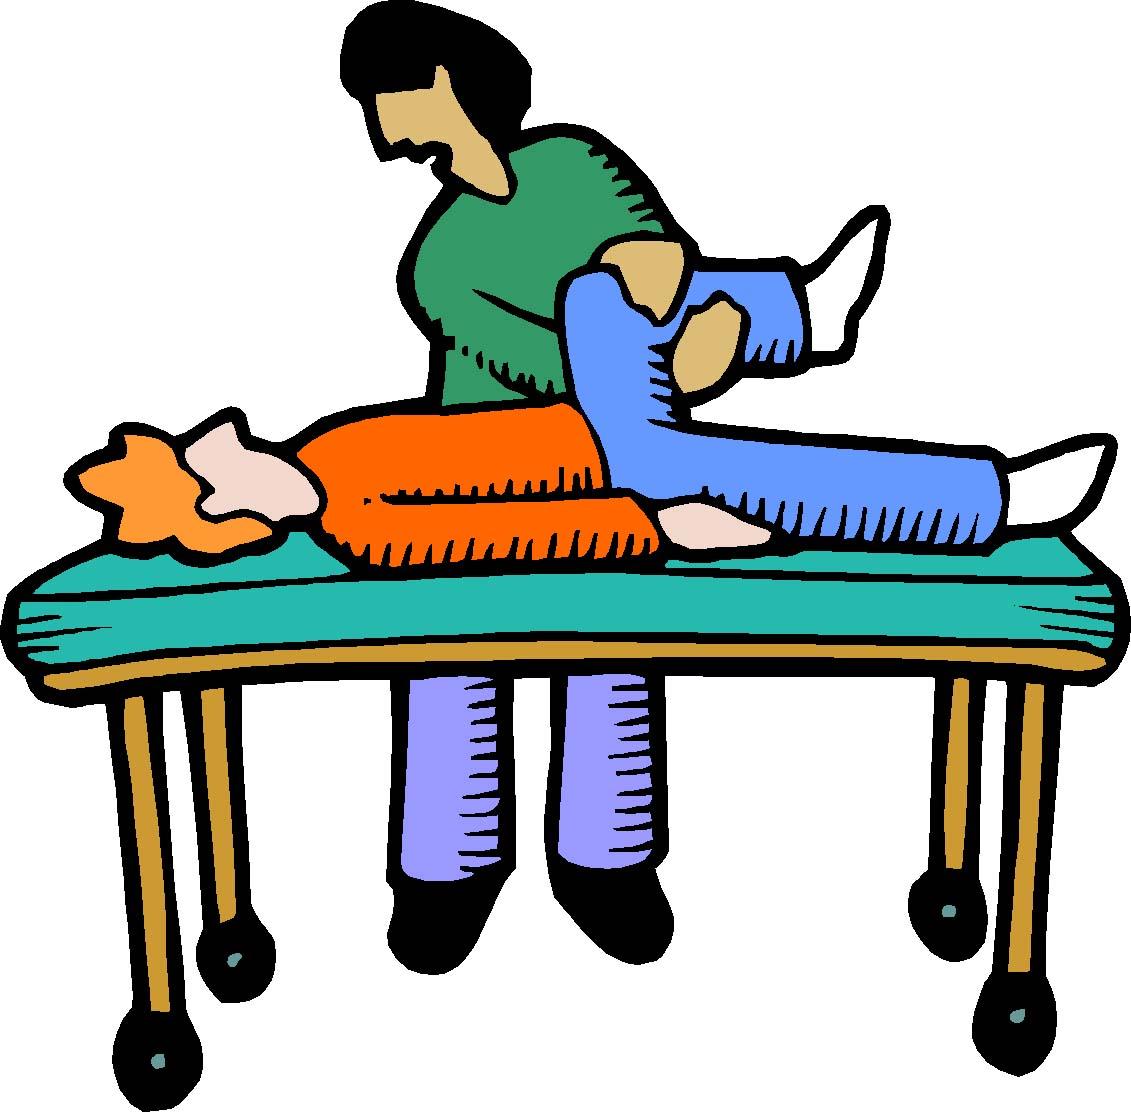 Treatment clipart job description For Treatment of Why